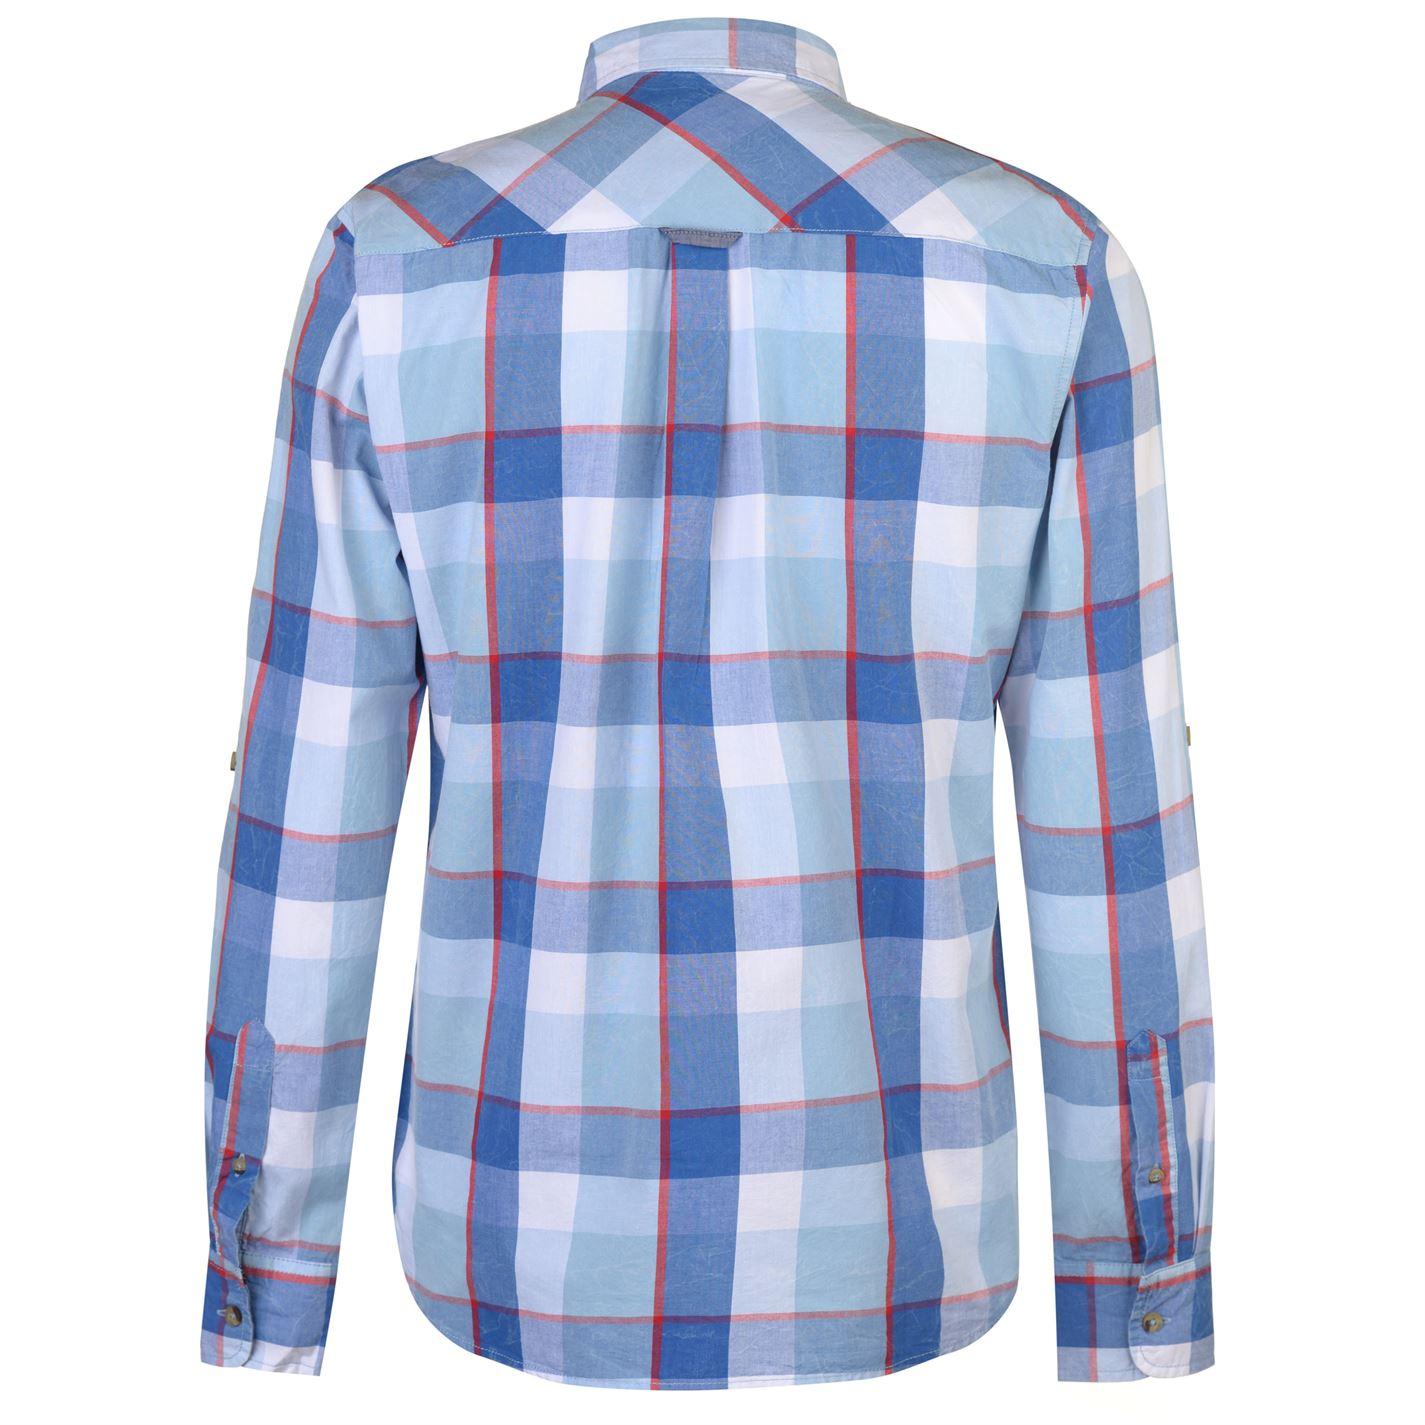 b3fee8b2631 SoulCal Mens Long Sleeve Check Shirt Casual Lightweight Cotton